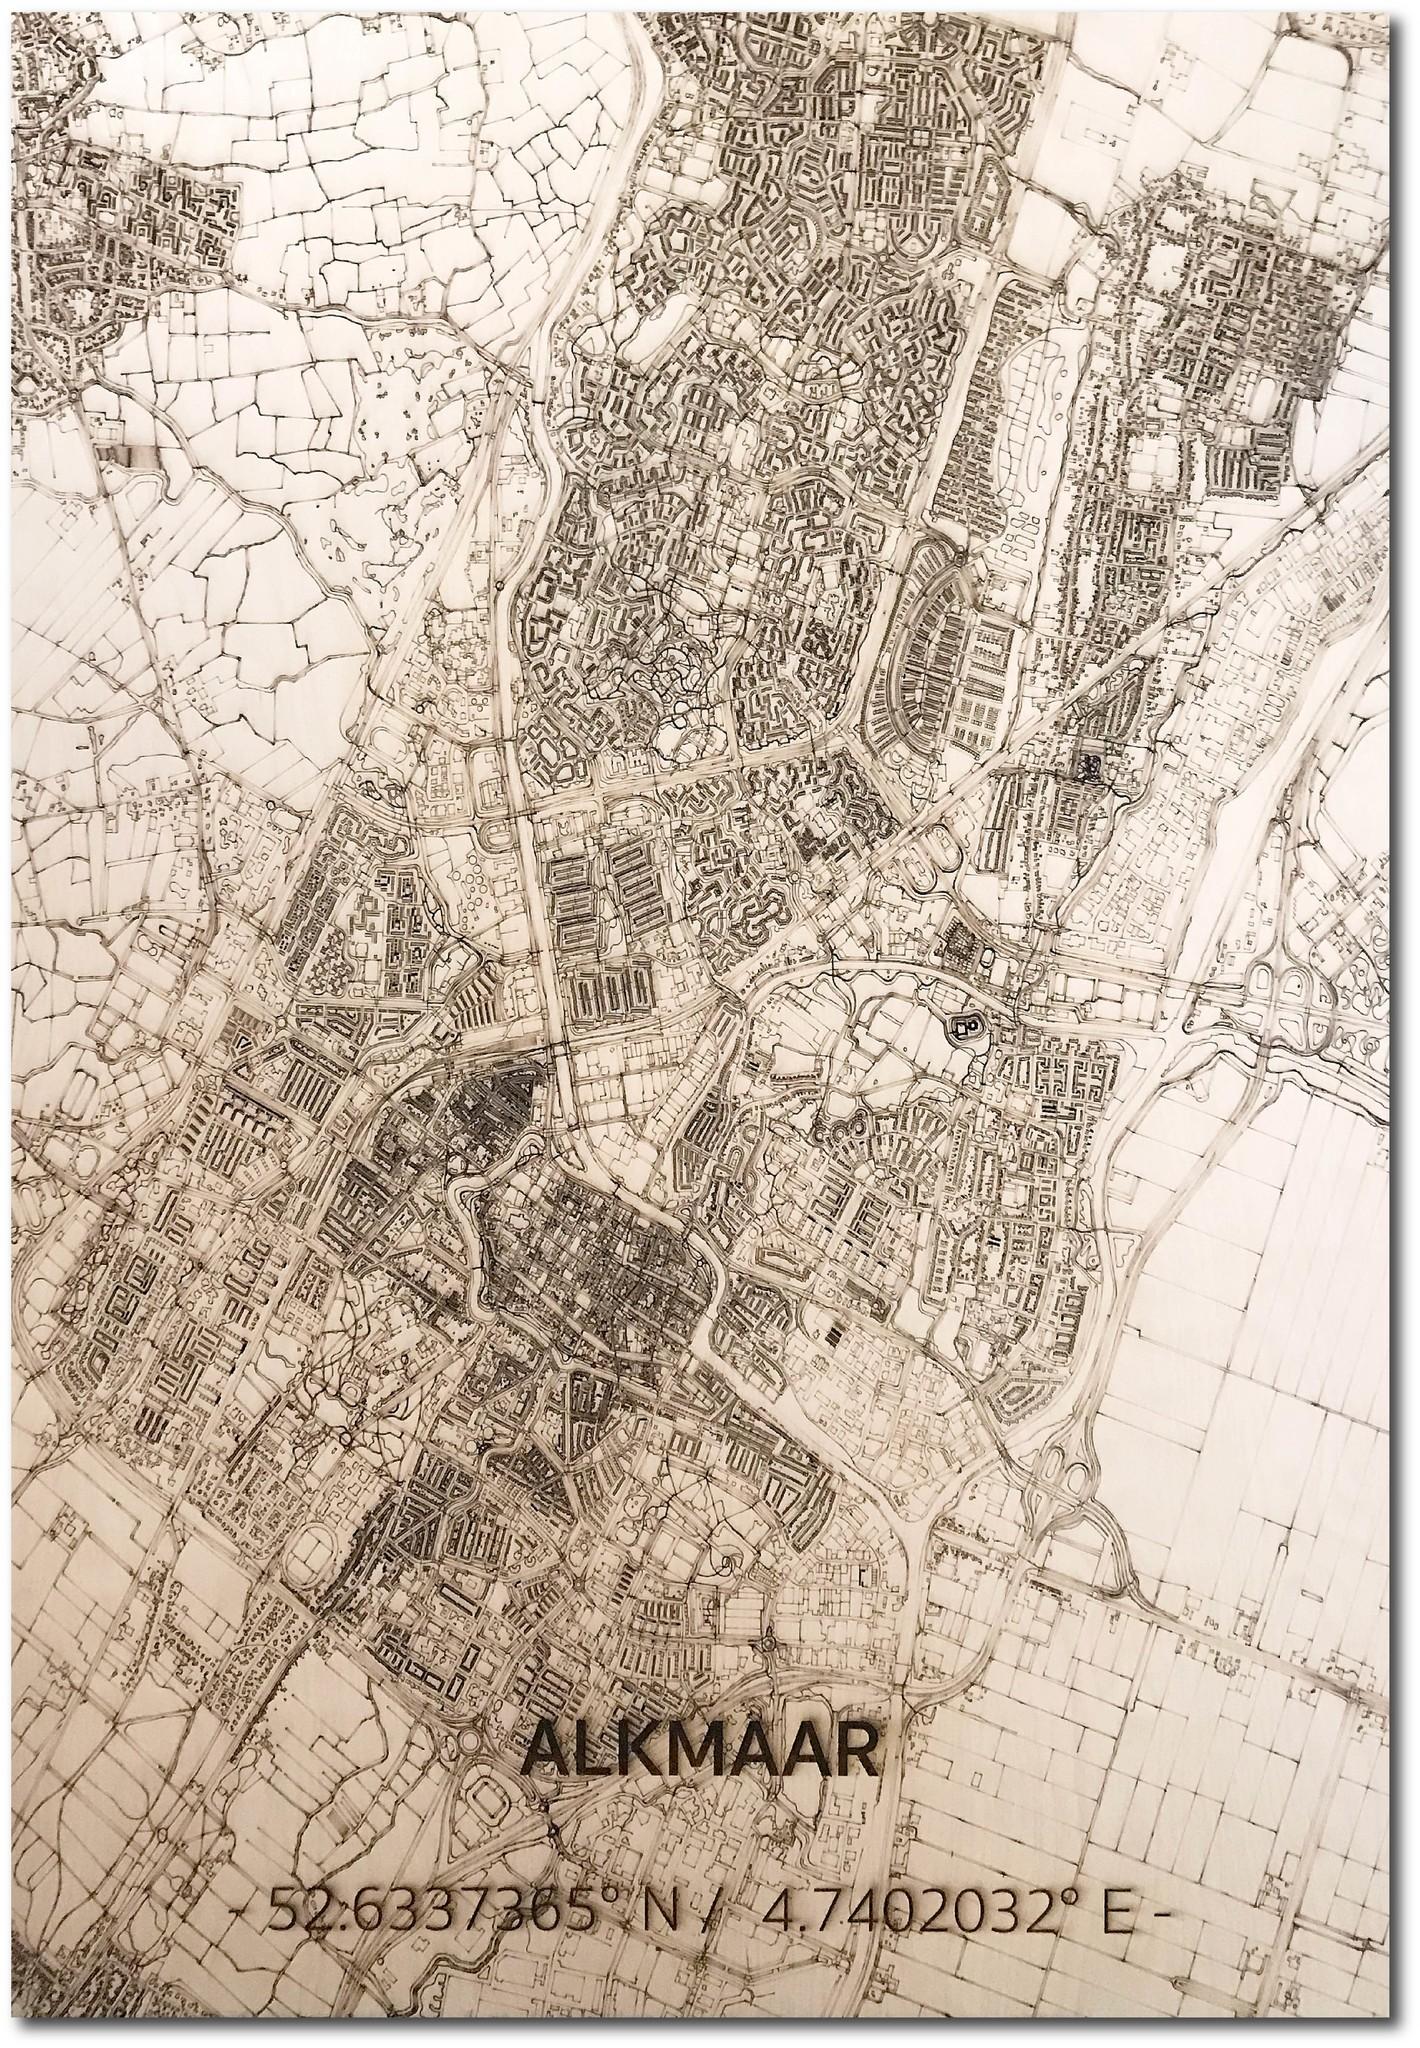 Stadtplan Alkmaar | Wanddekoration Holz-1